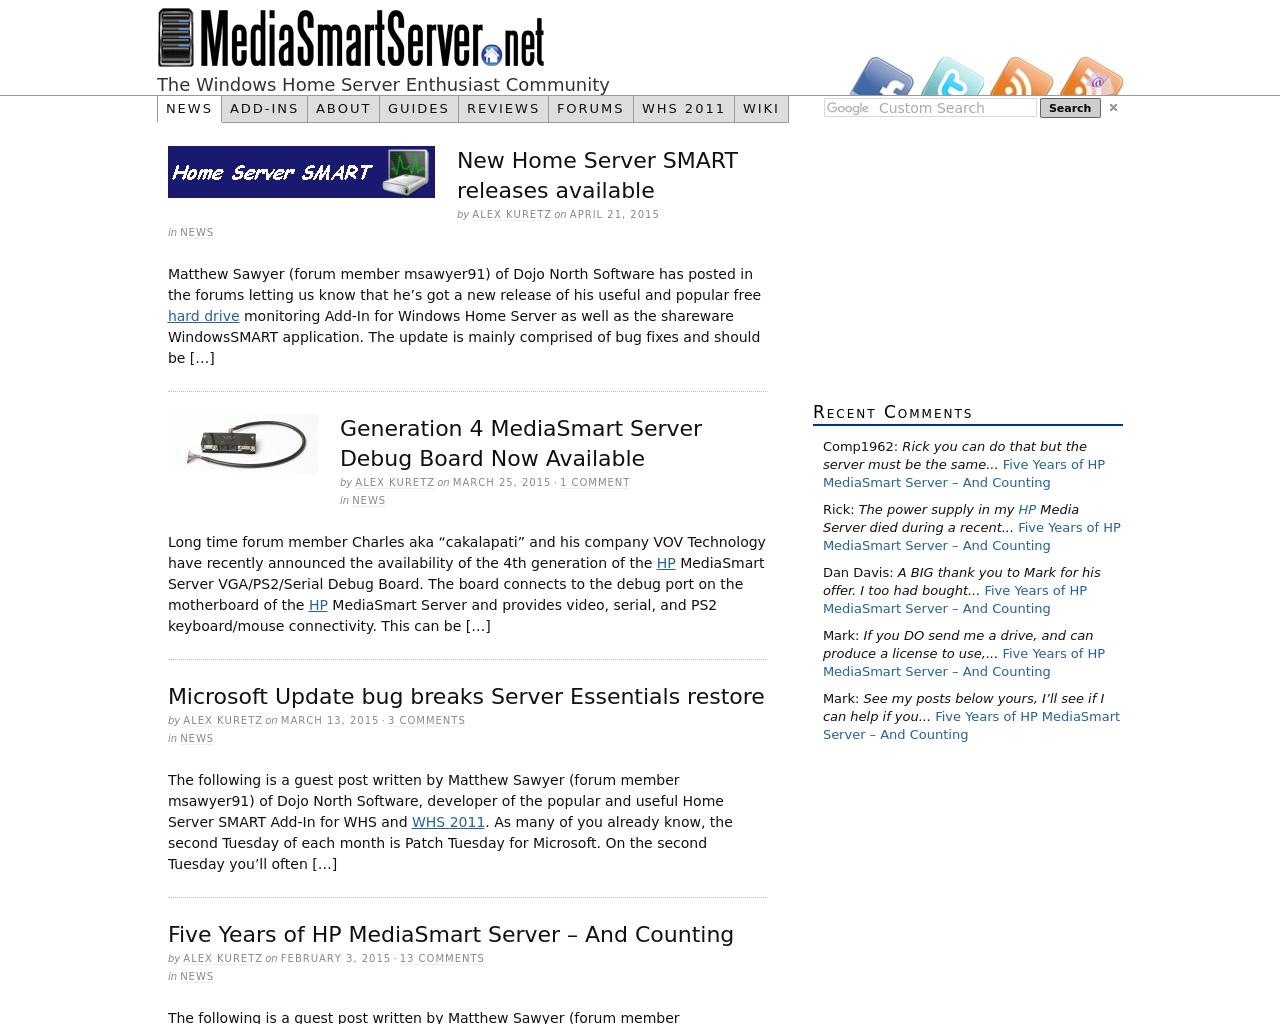 MediaSmartServer-Advertising-Reviews-Pricing